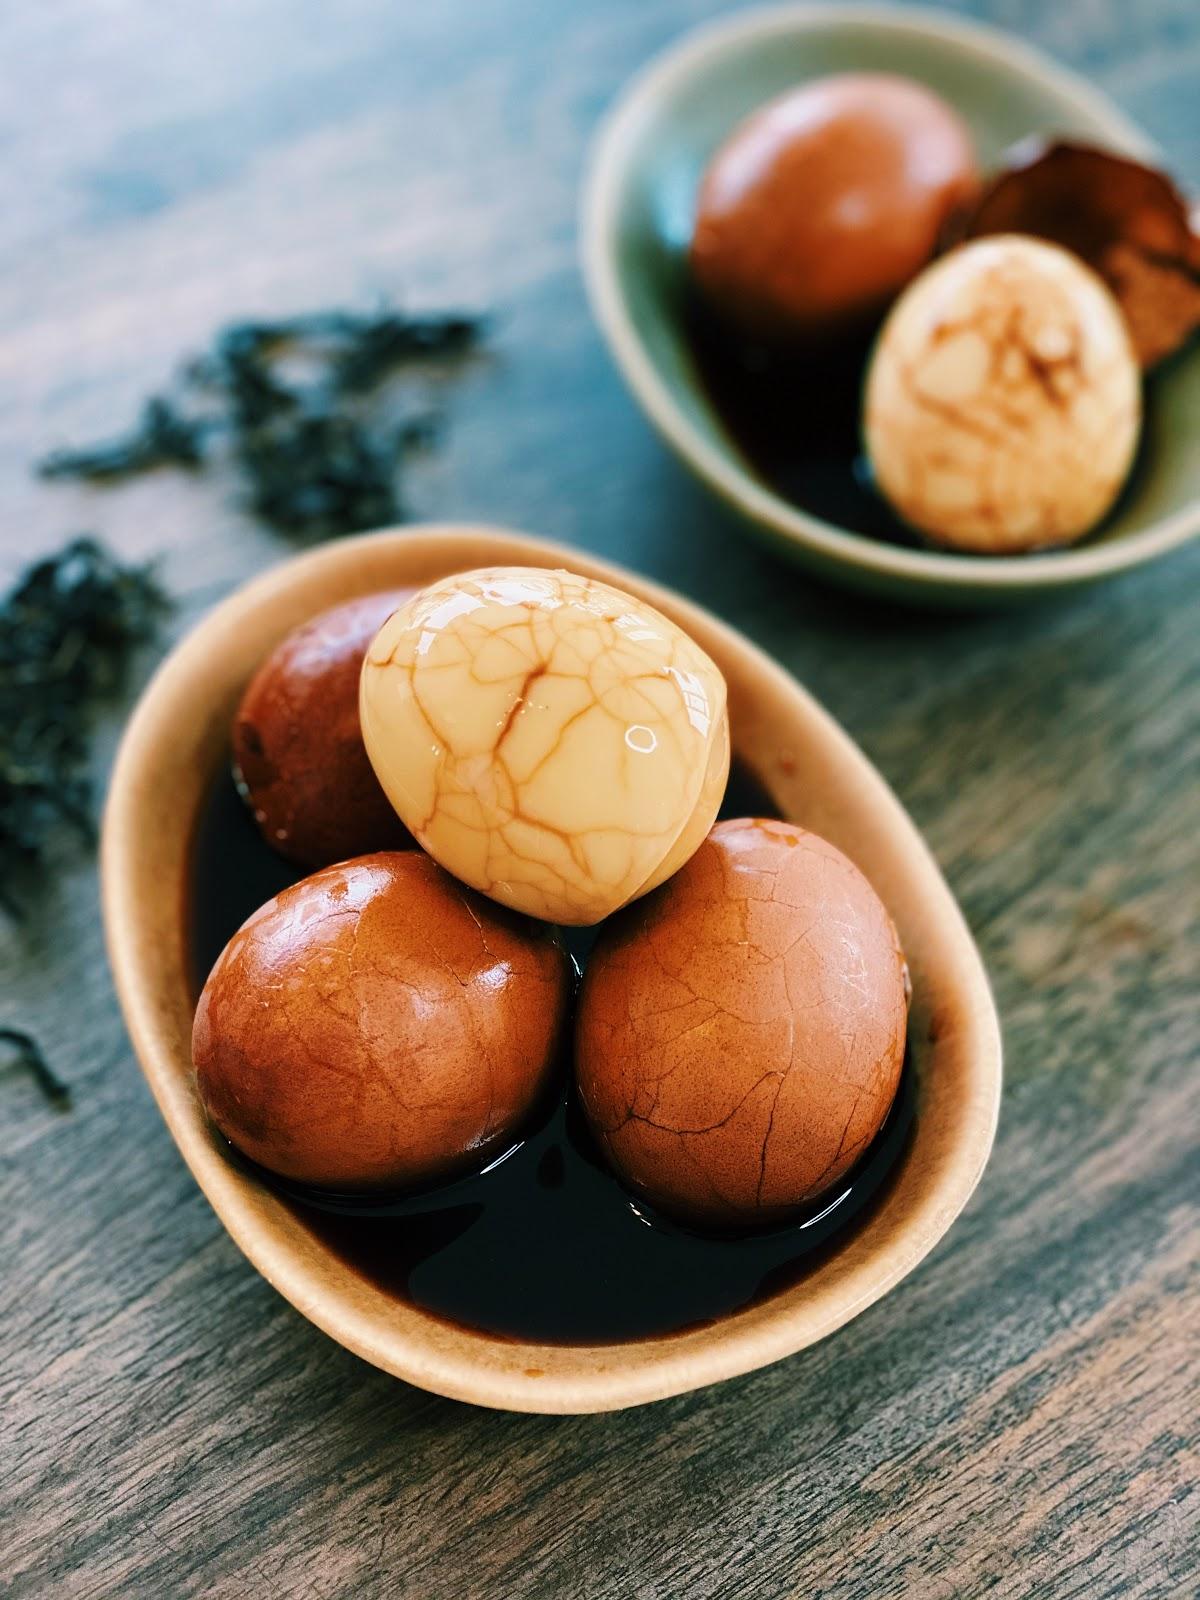 Authentic Braised Tea Eggs (Easy and Inexpensive)